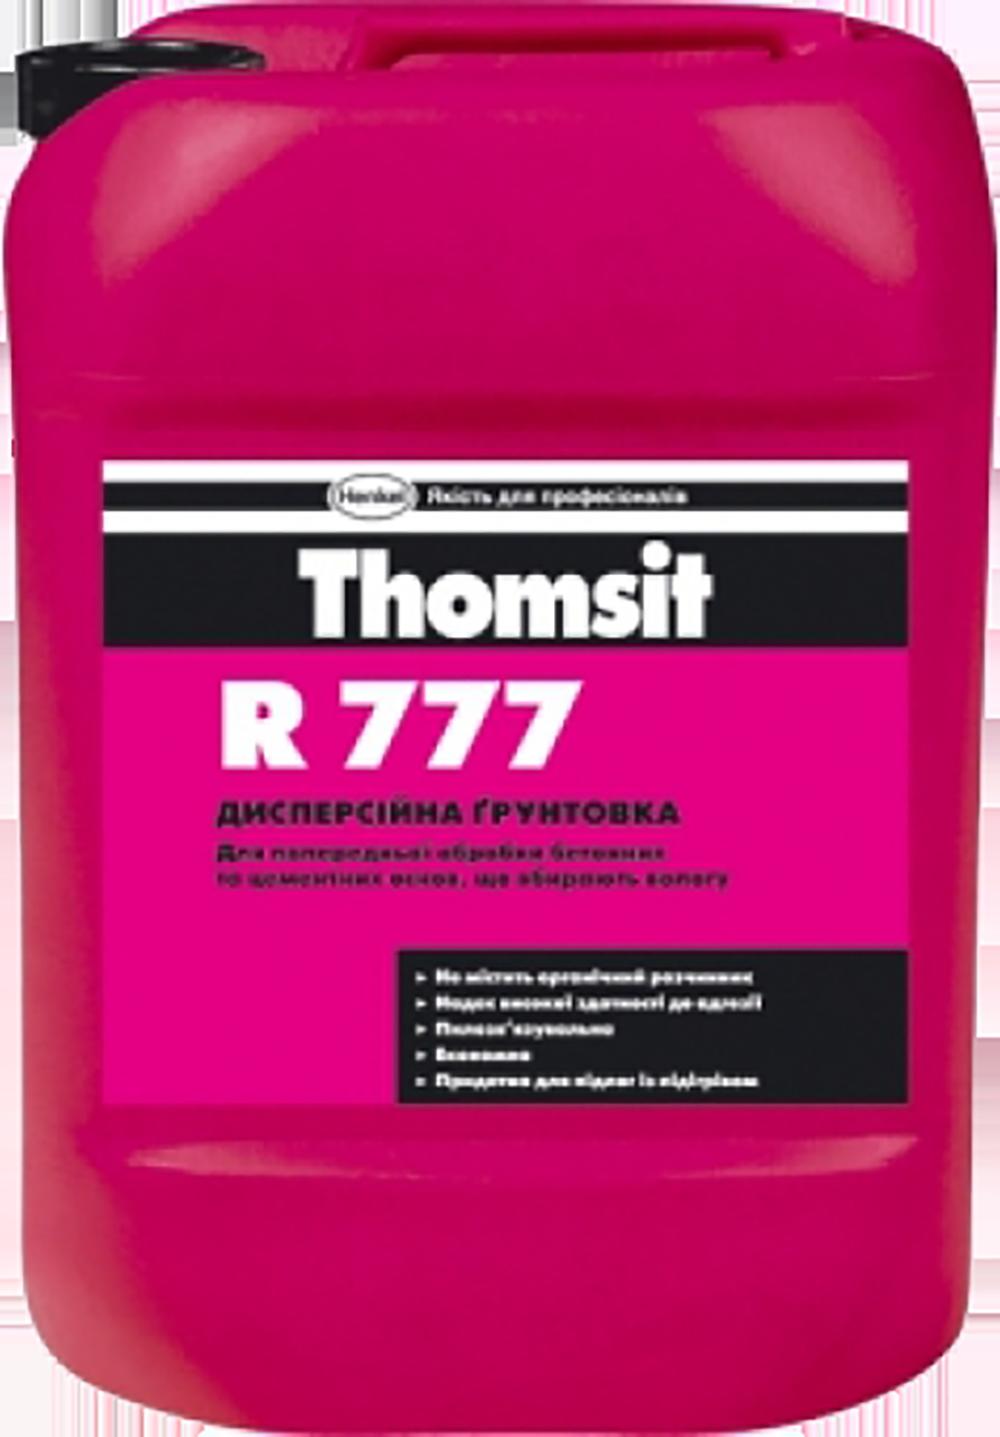 Купить дисперсионную грунтовку Thomsit R 777